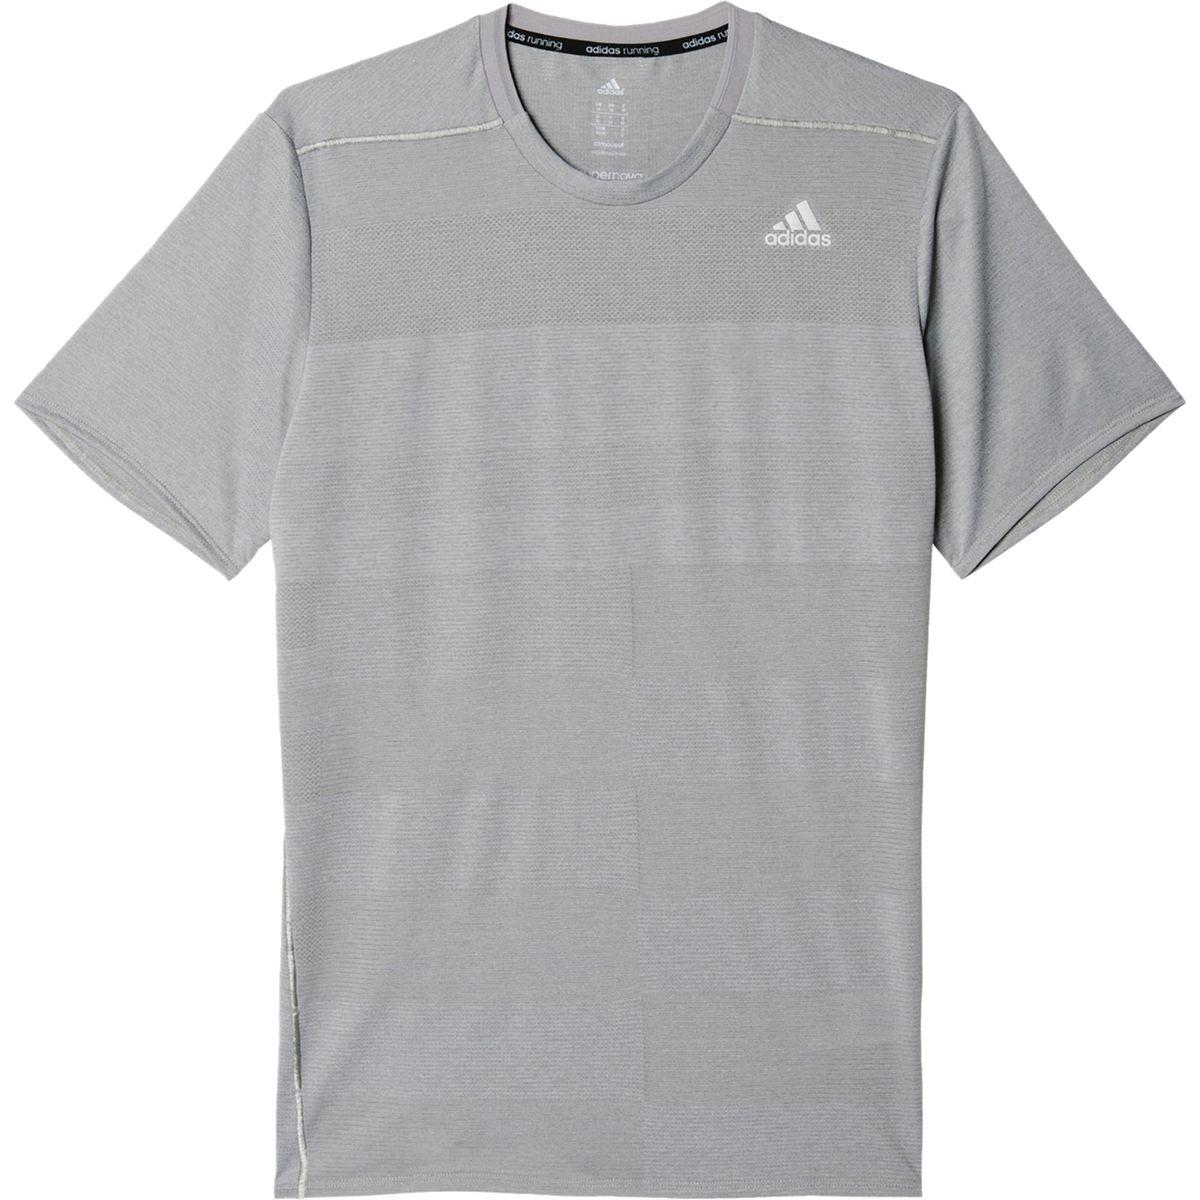 Adidas Supernova Short-Sleeve T-Shirt - Men